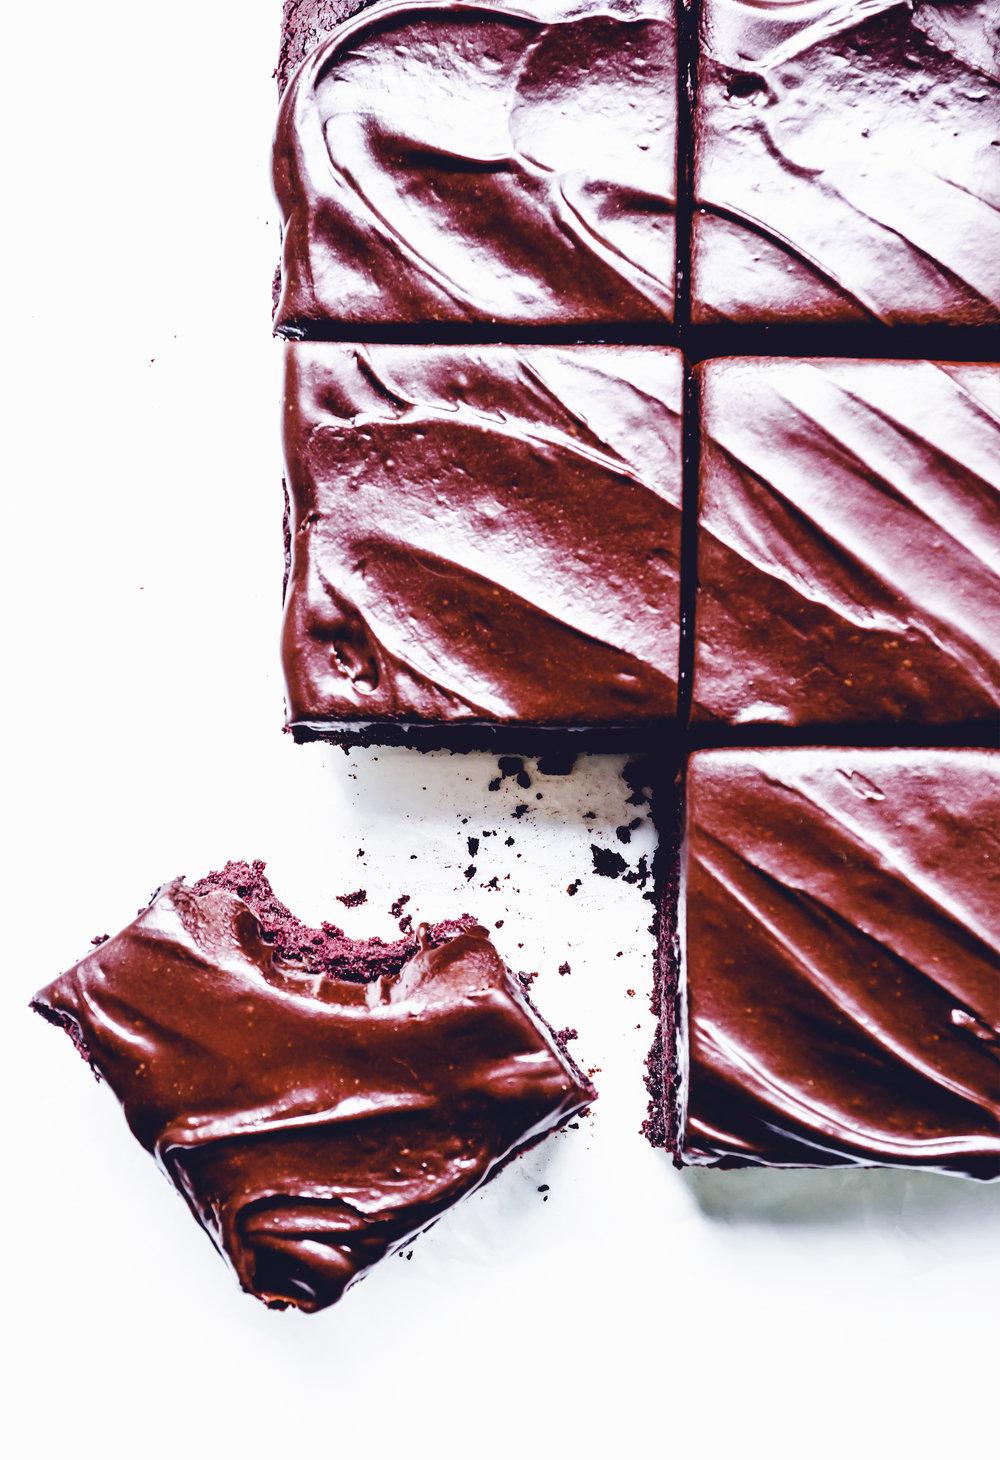 beetroot brownies - Delicious Monster